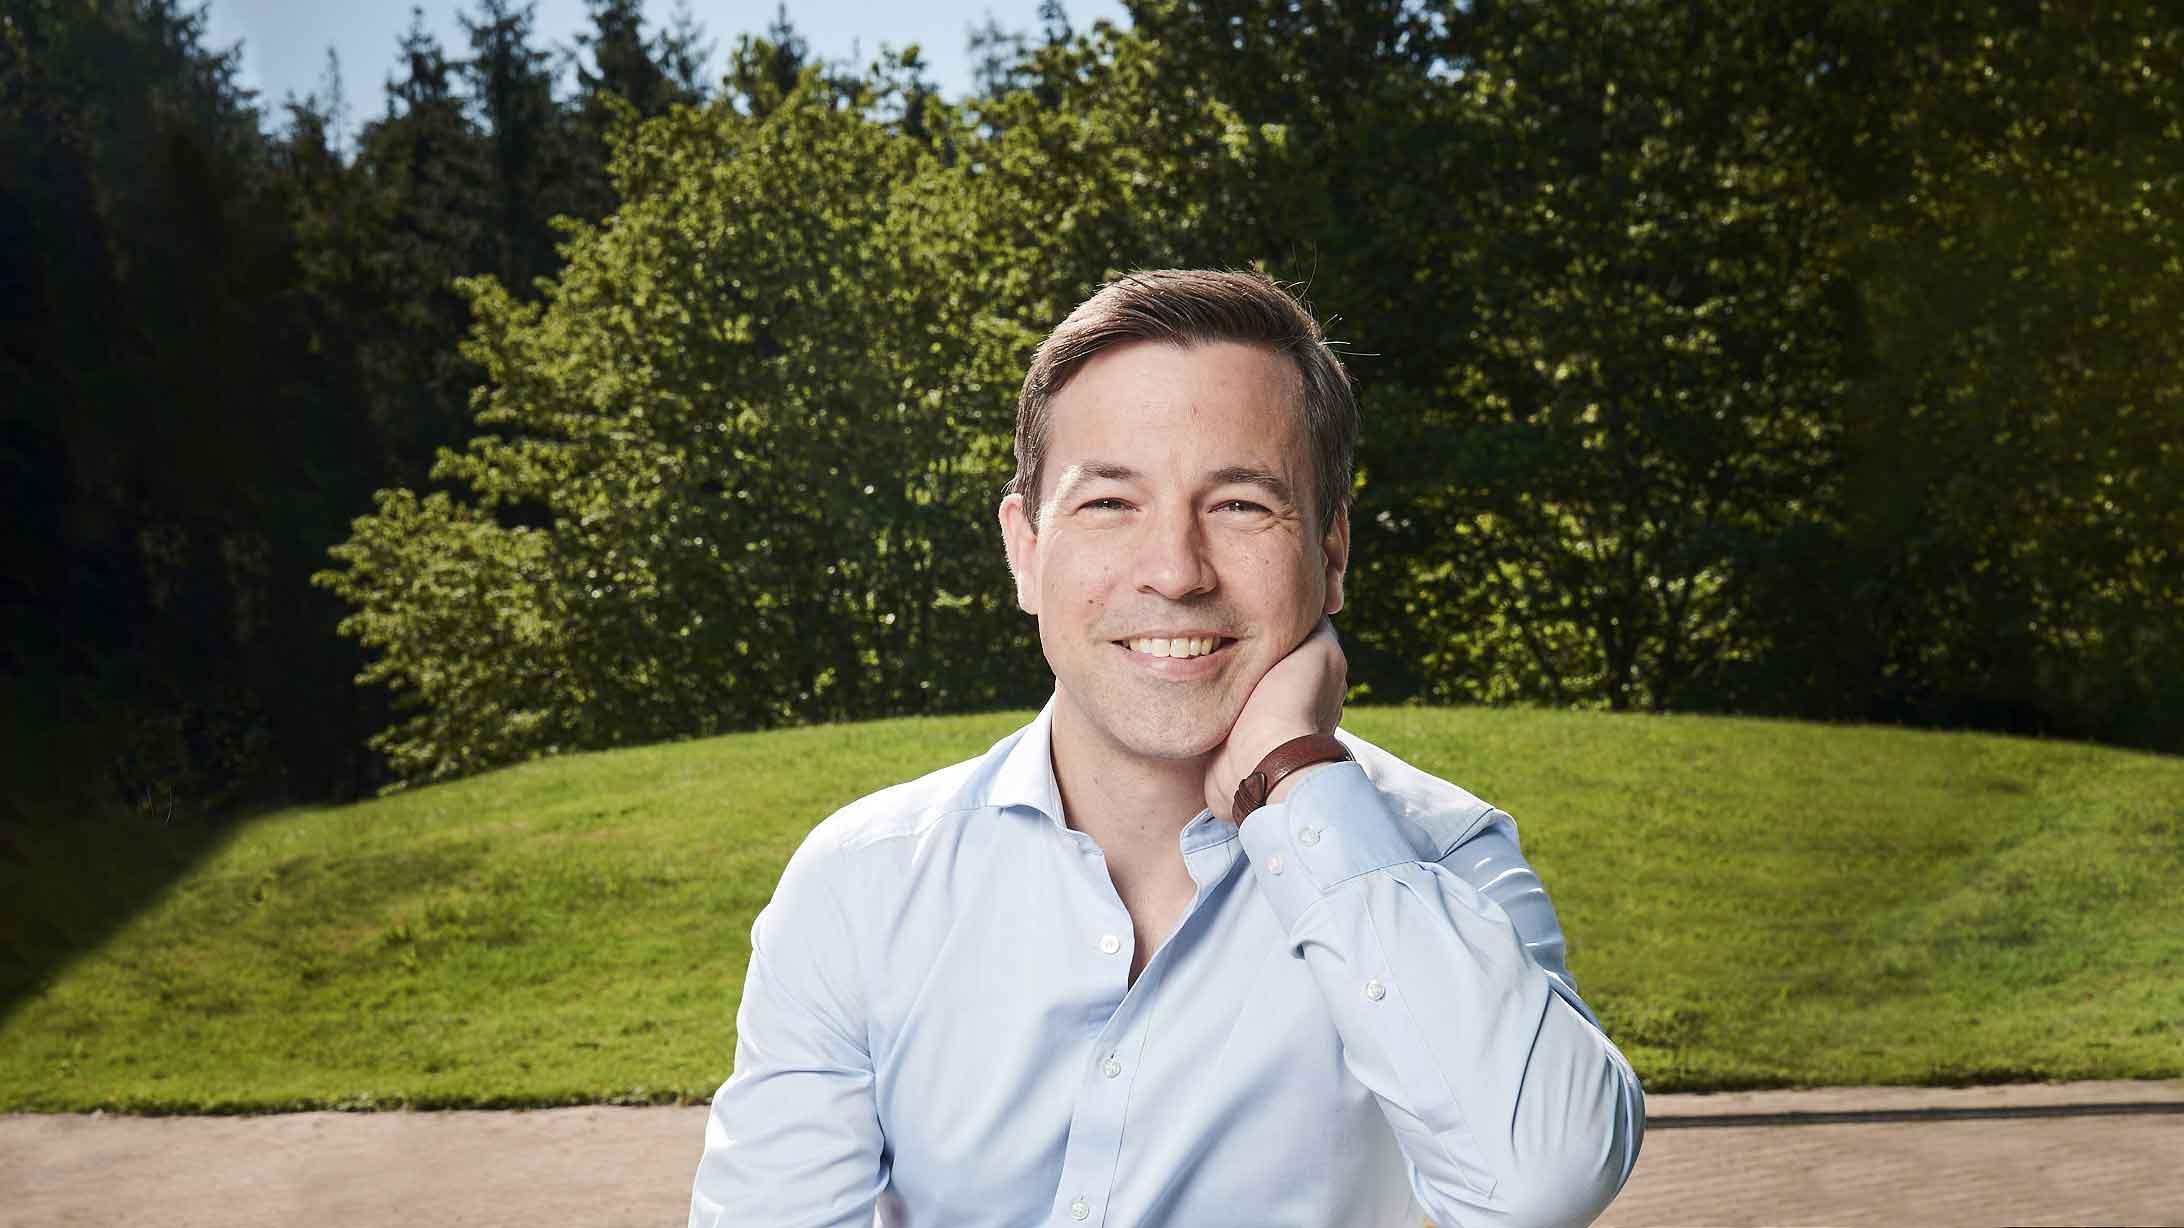 Martin Heubner, Chefarzt der Gynäkologie am KSB